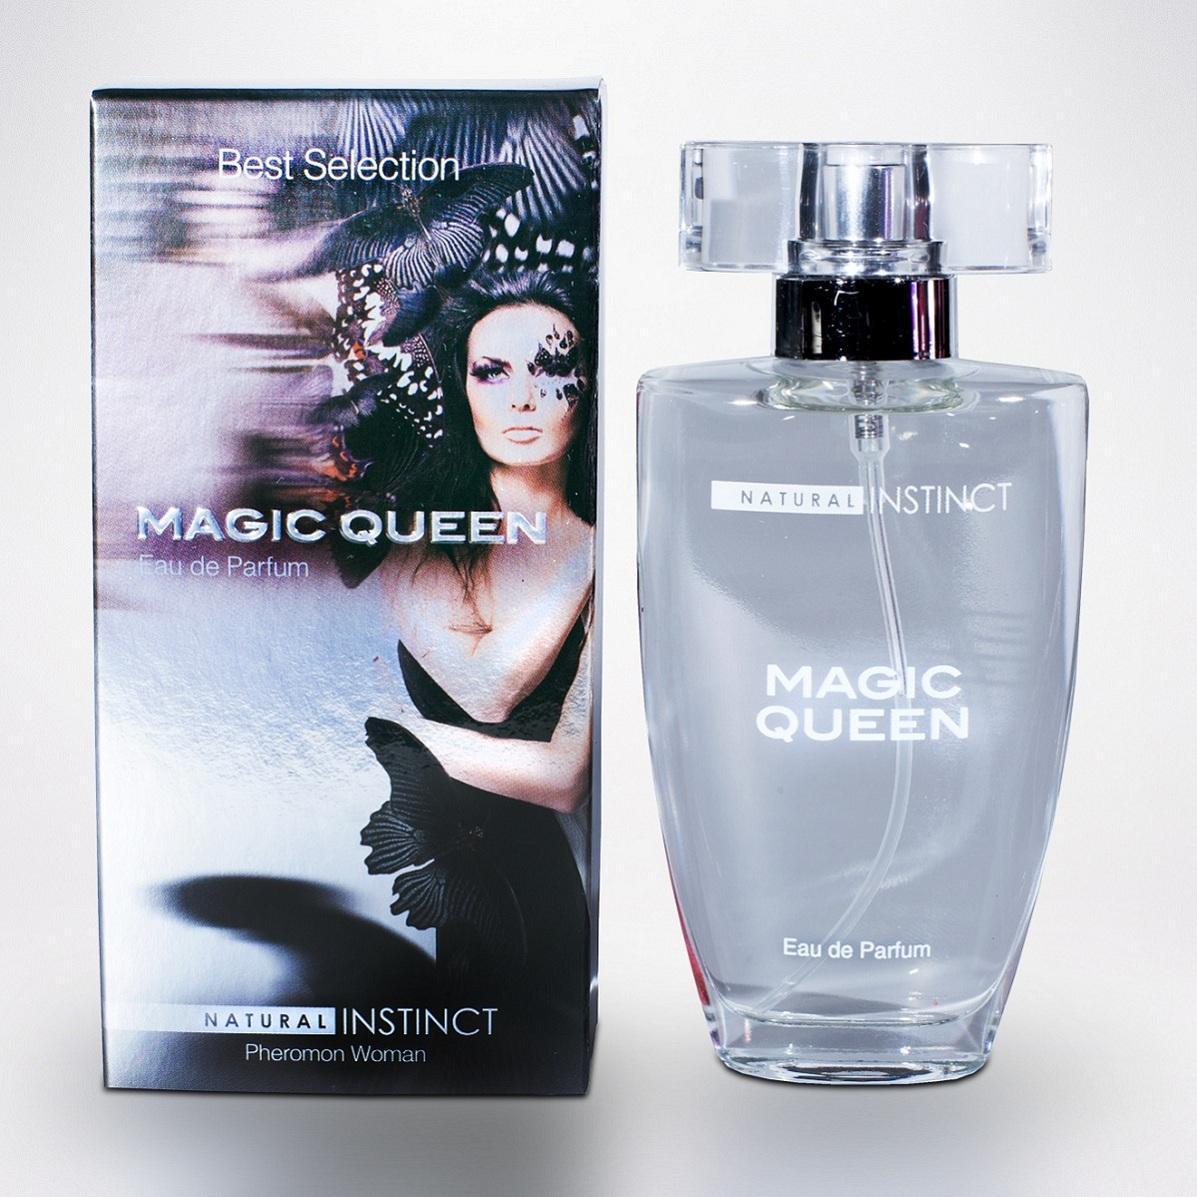 Женские духи с феромонами Natural Instinct Magiс Queen - 50 мл.-6315